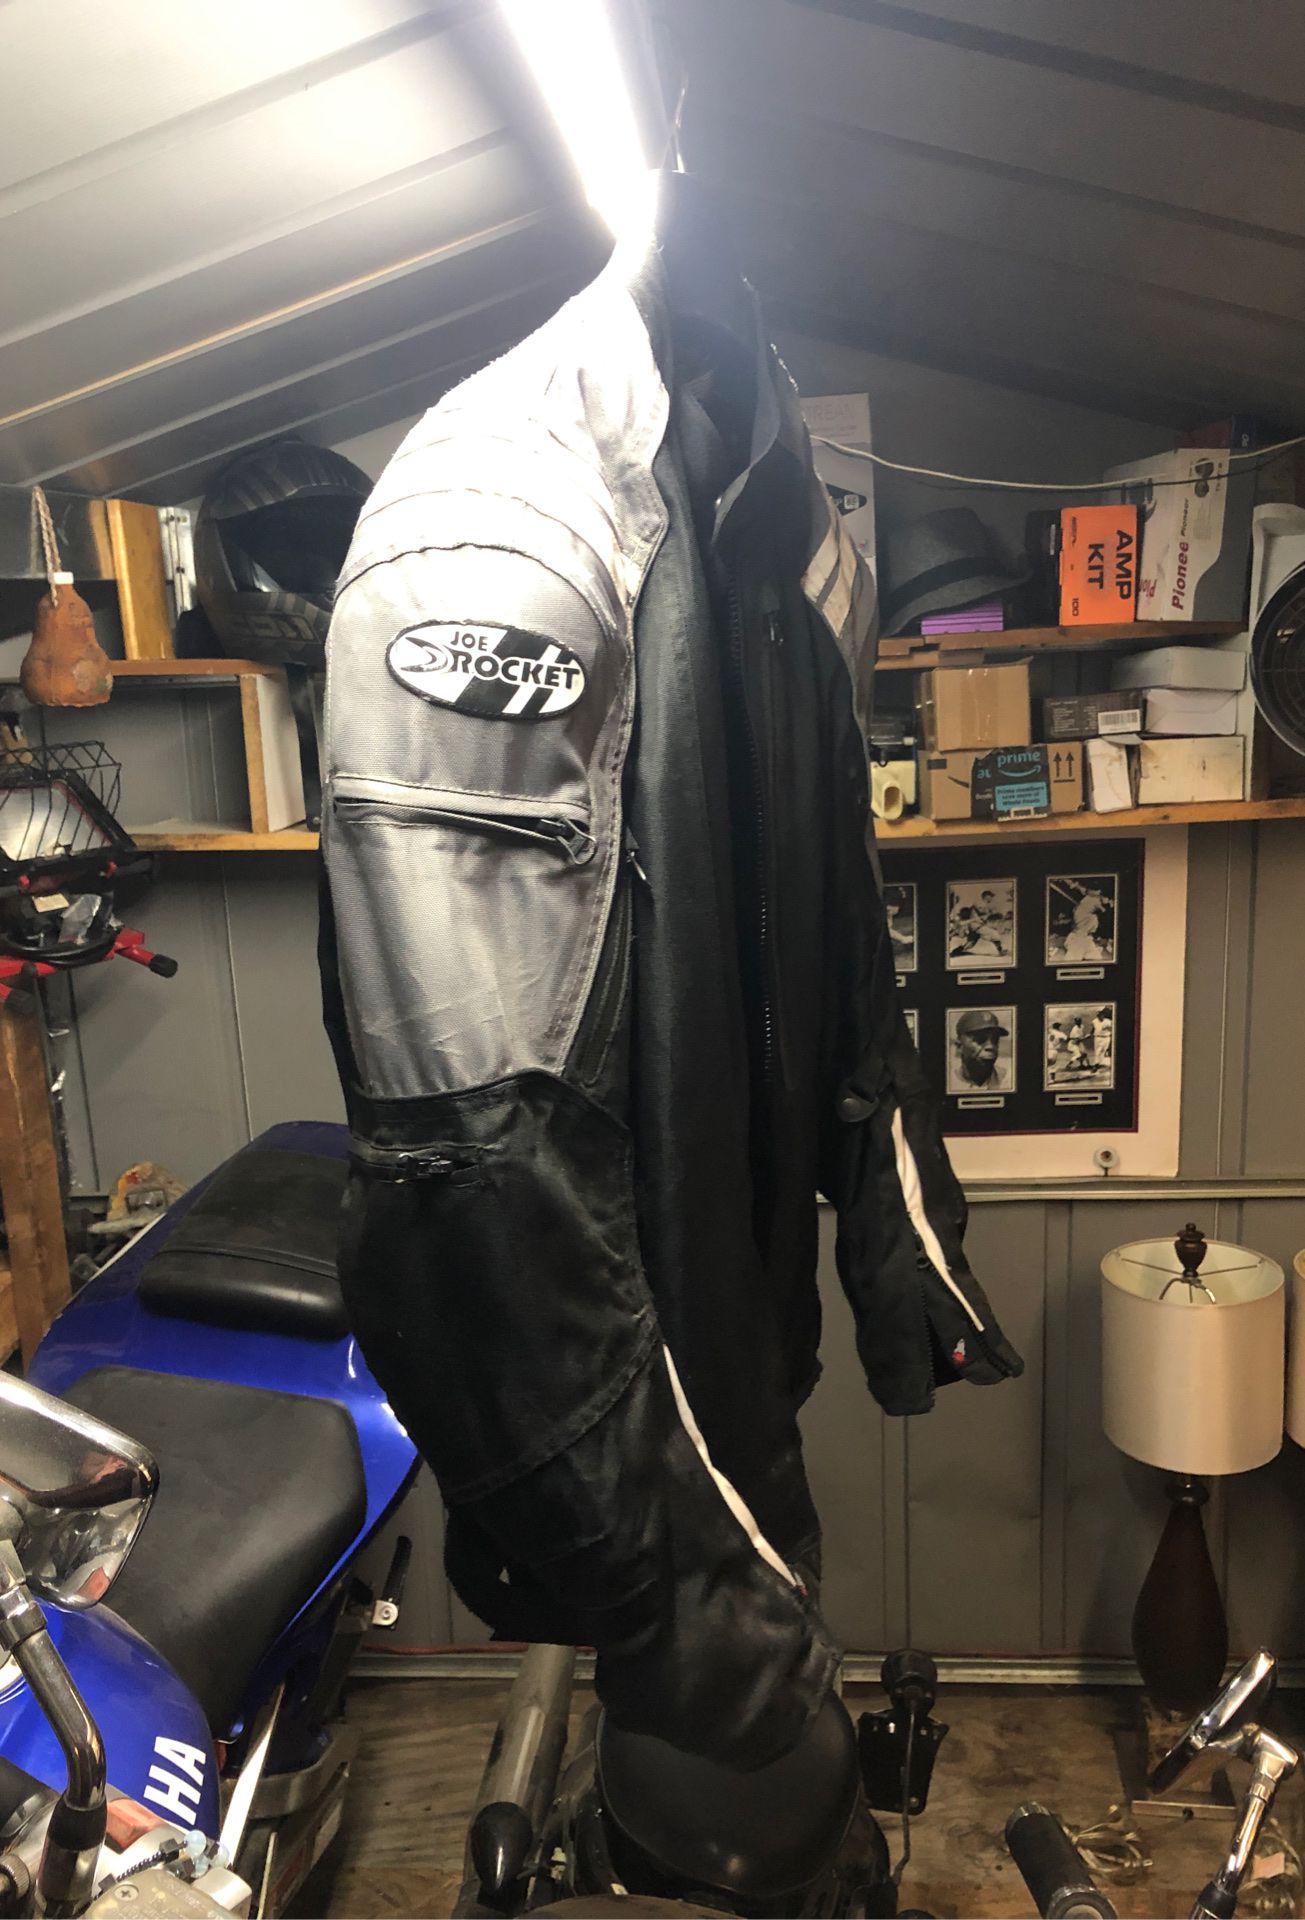 Joe rocket motorcycle jacket.